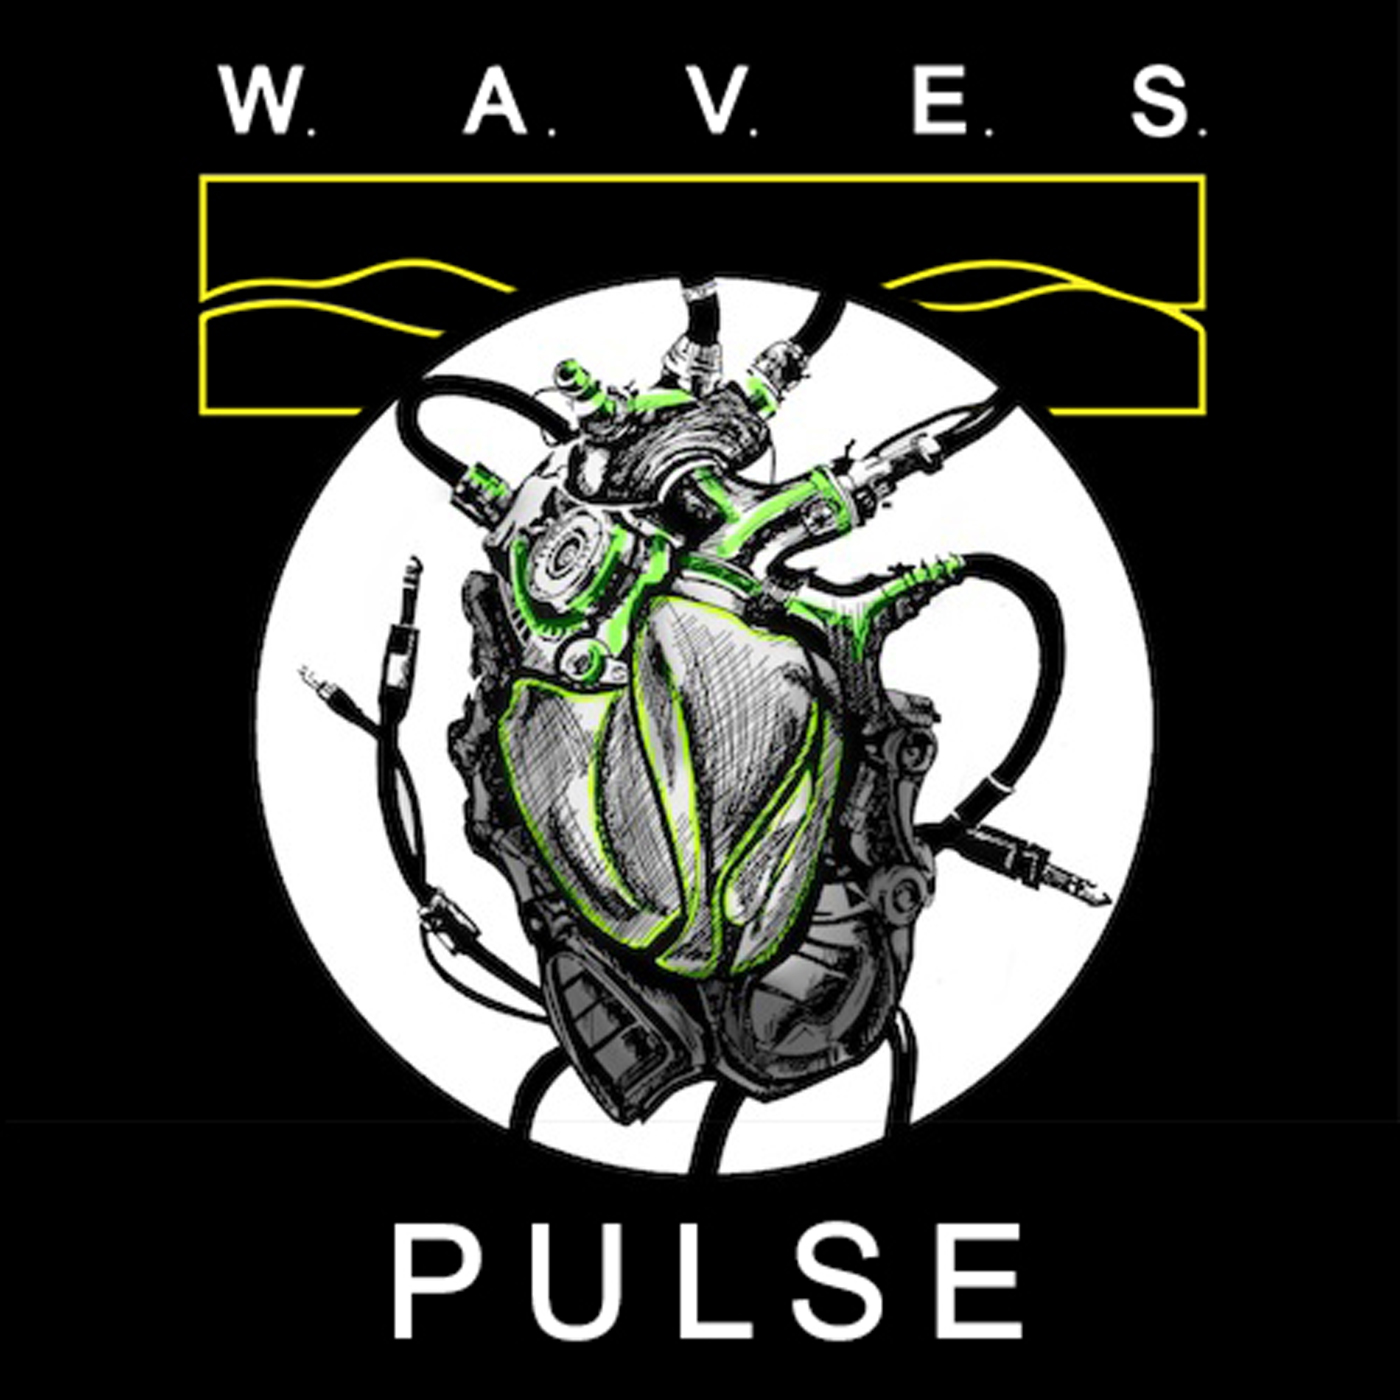 W.A.V.E.S. - Pulse (Single)